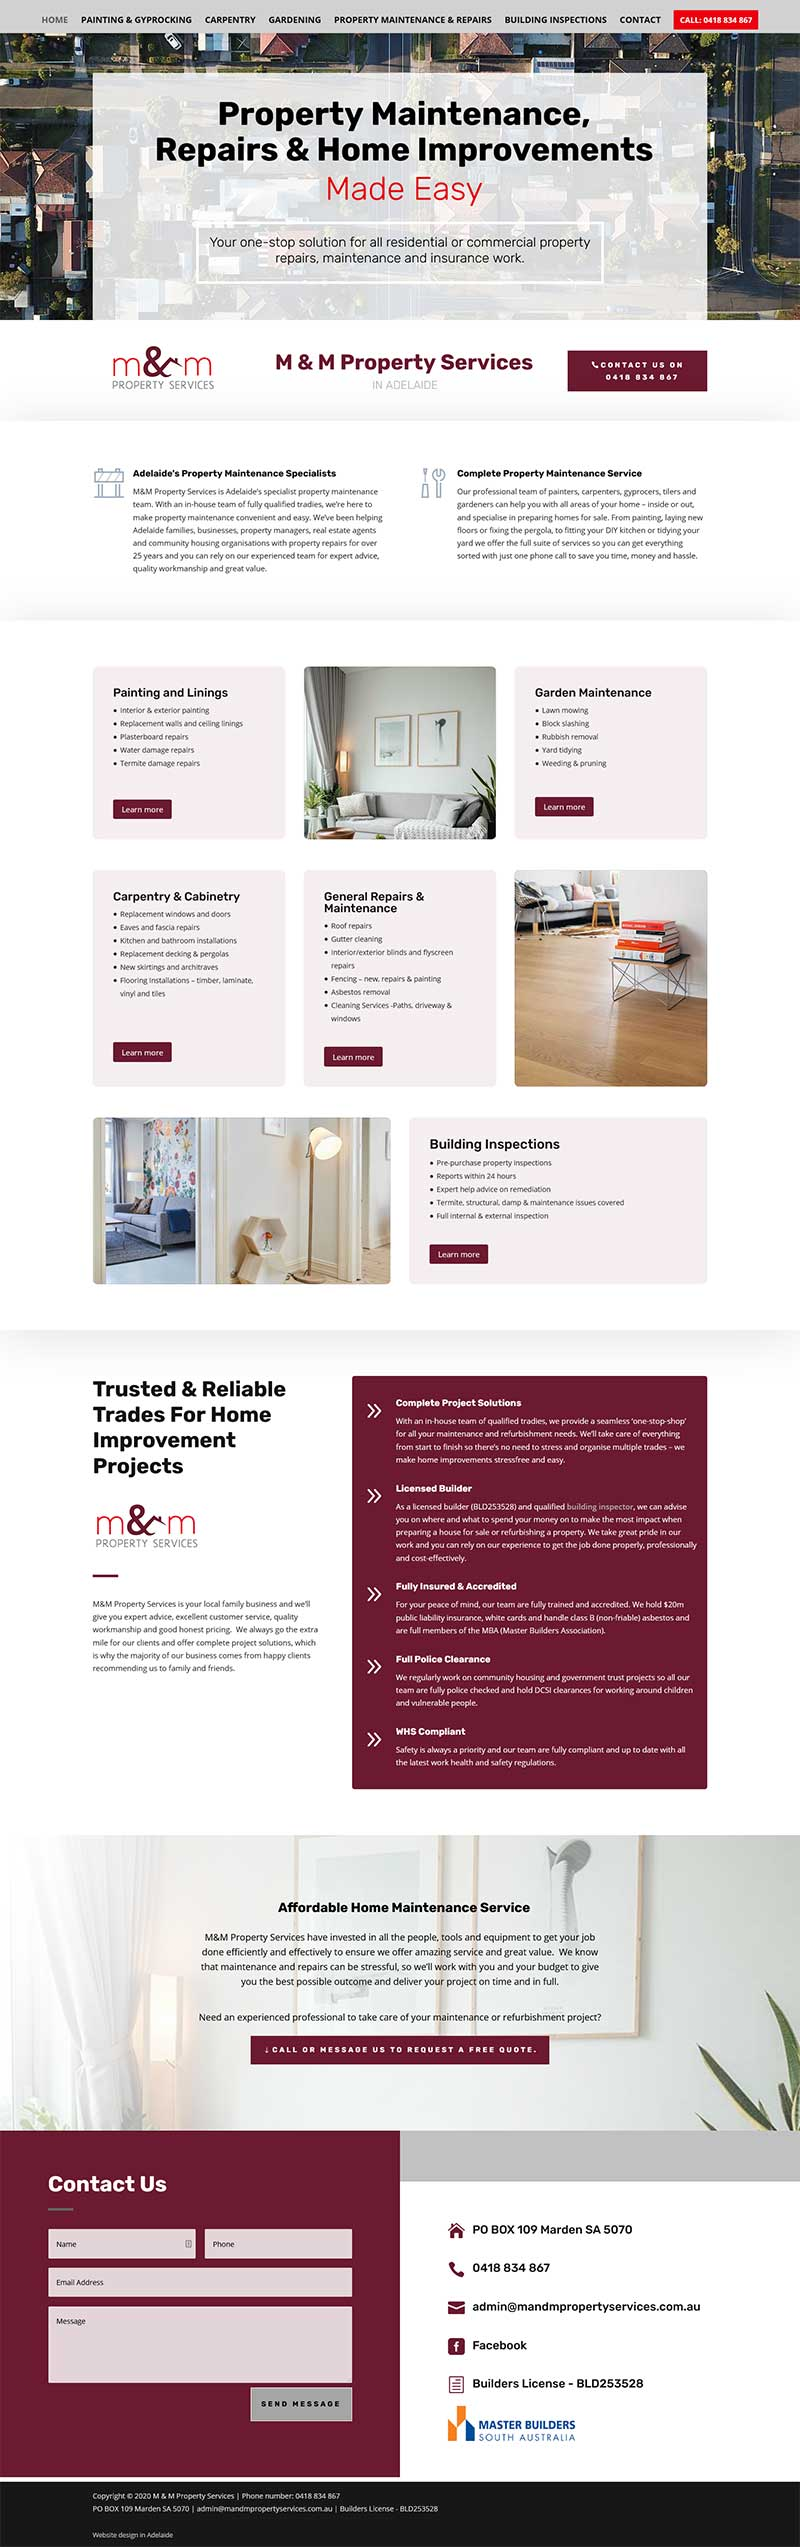 website design Divi WordPress Adelaide